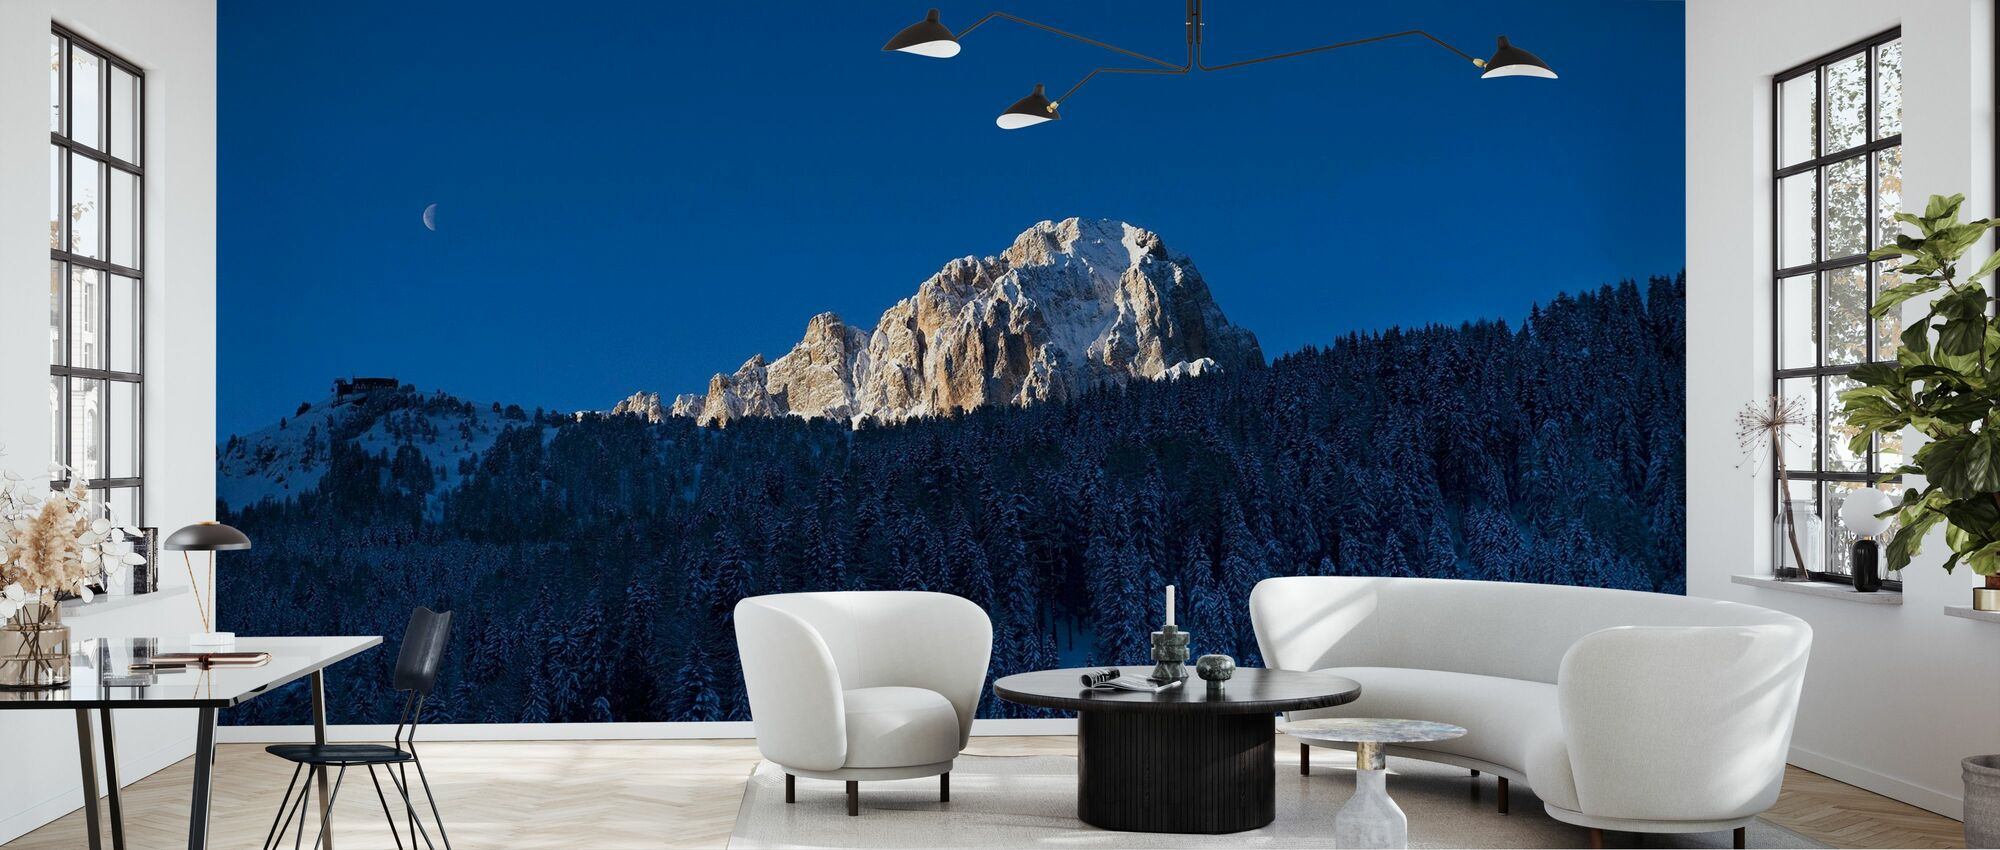 Val Gardena, Dolomites in Italy - Wallpaper - Living Room